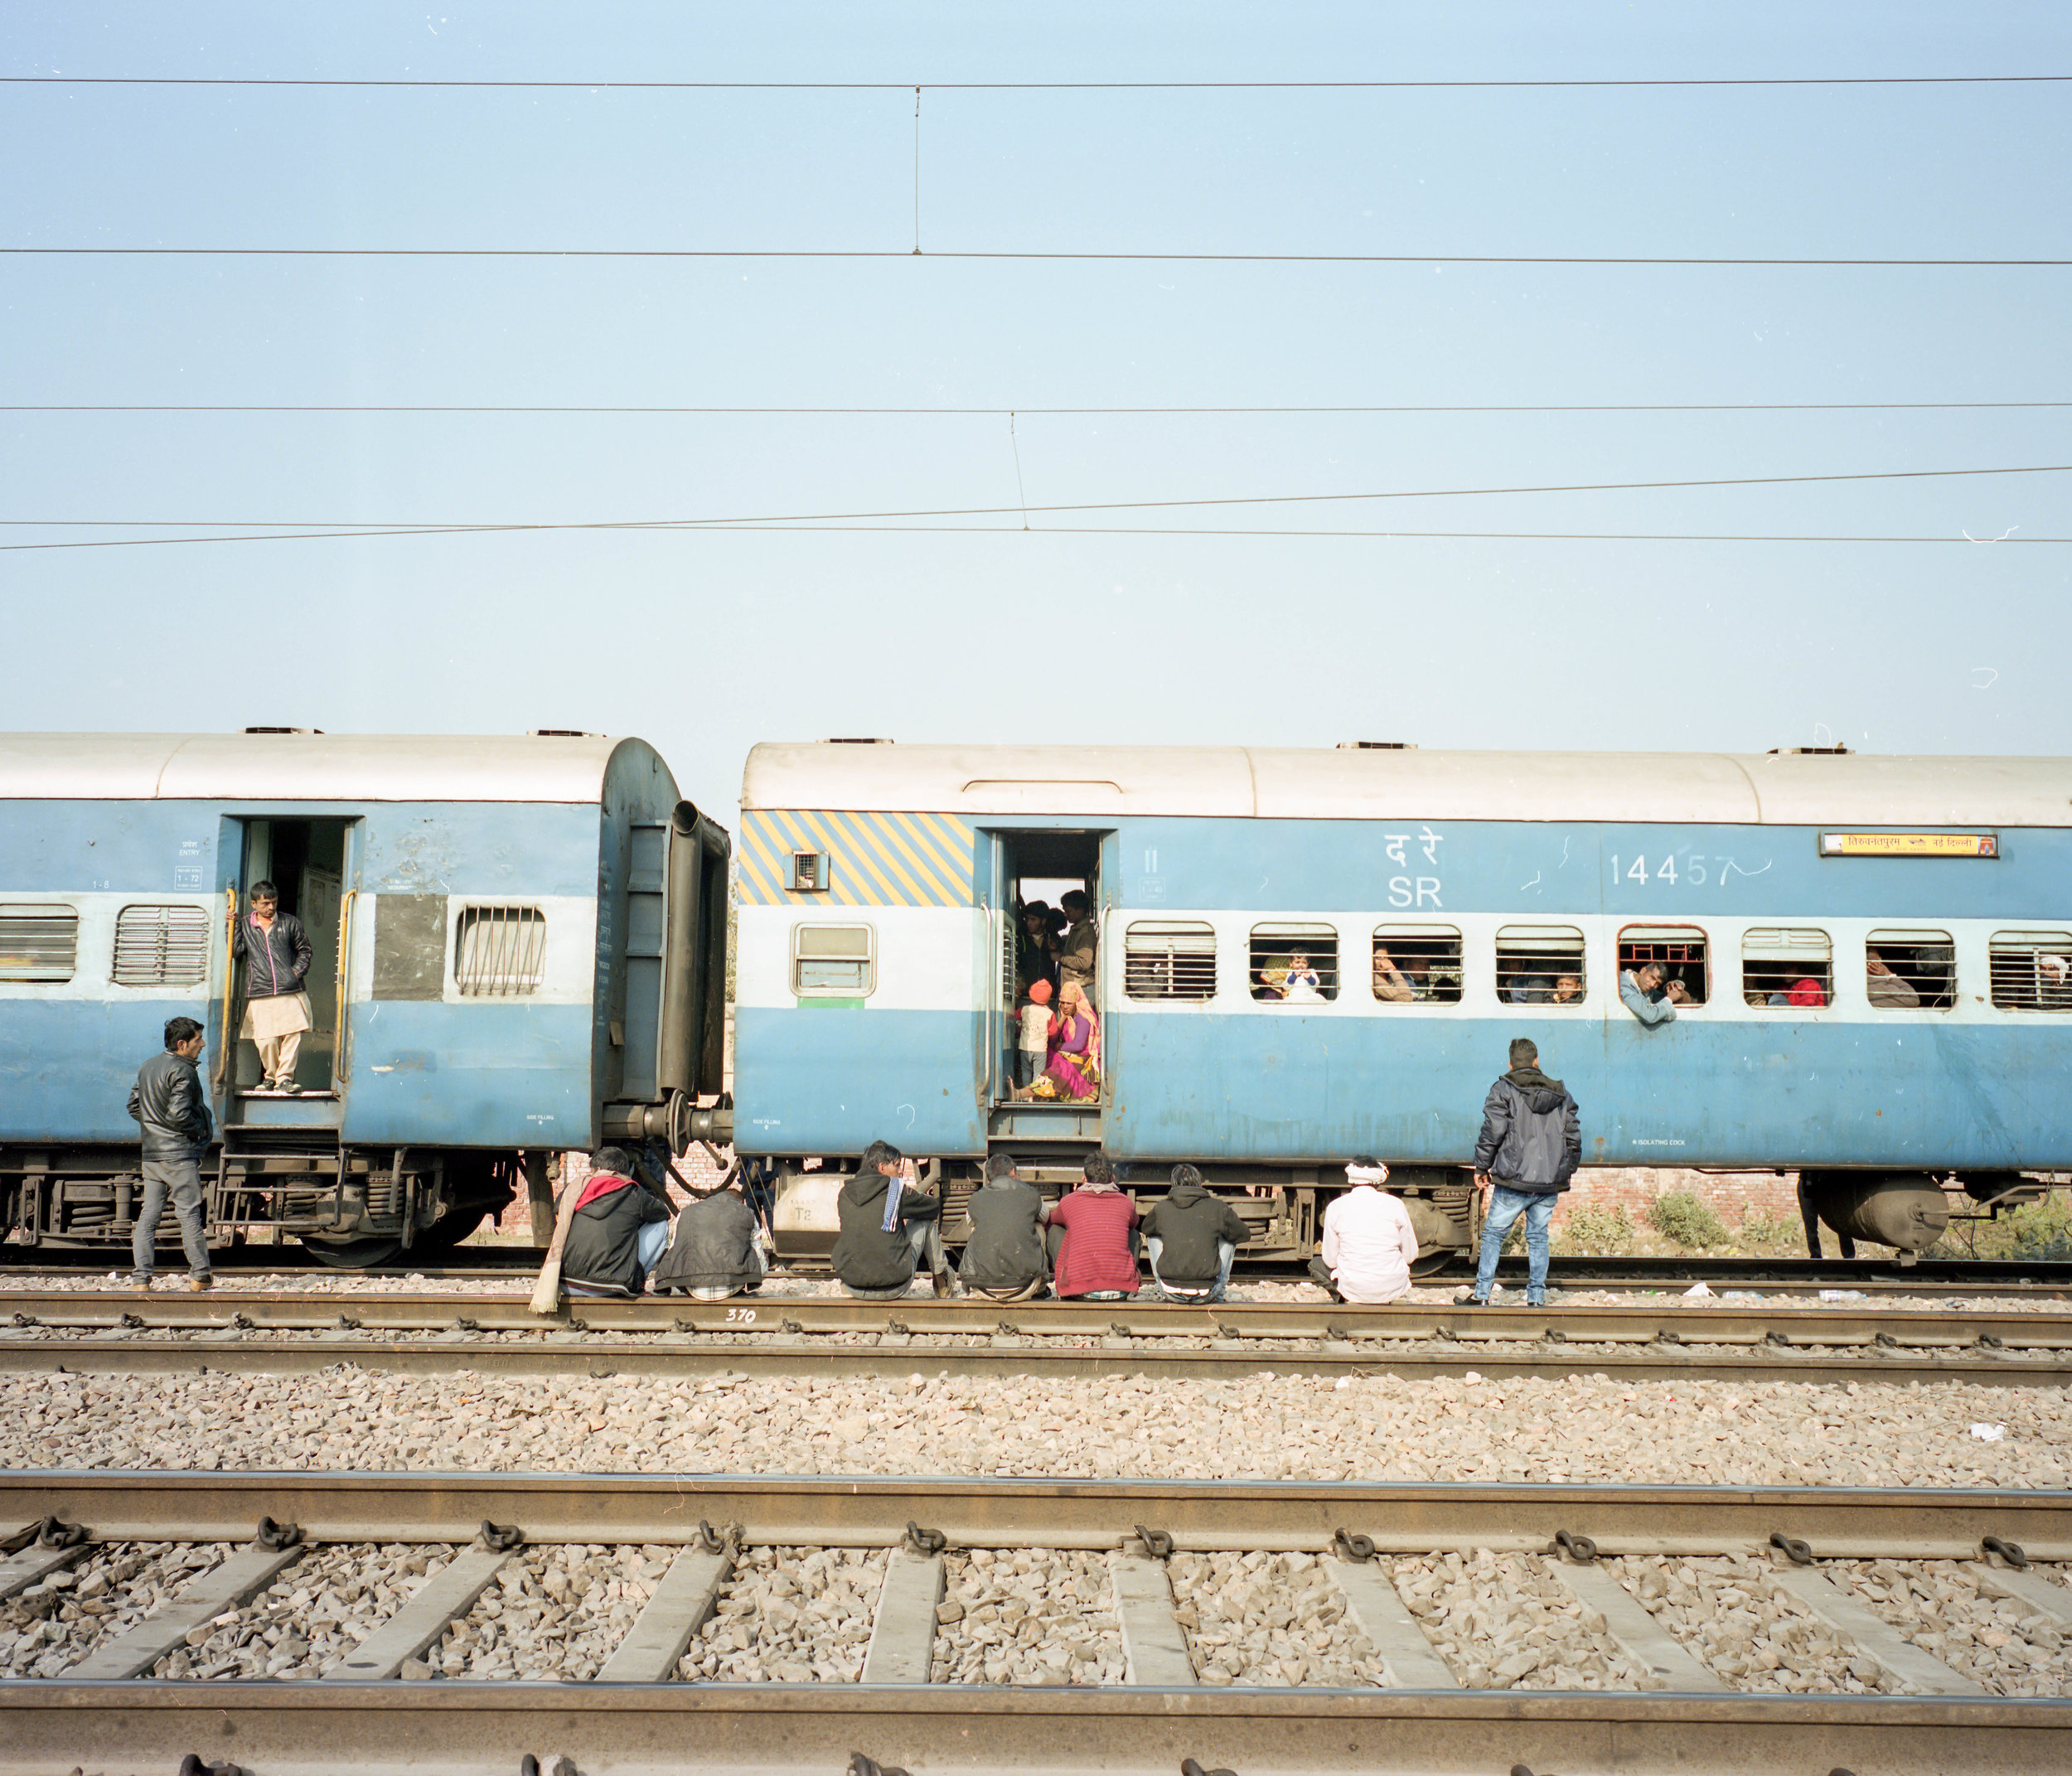 The Waiting Game Fuji GF670w | Kodak Portra 400